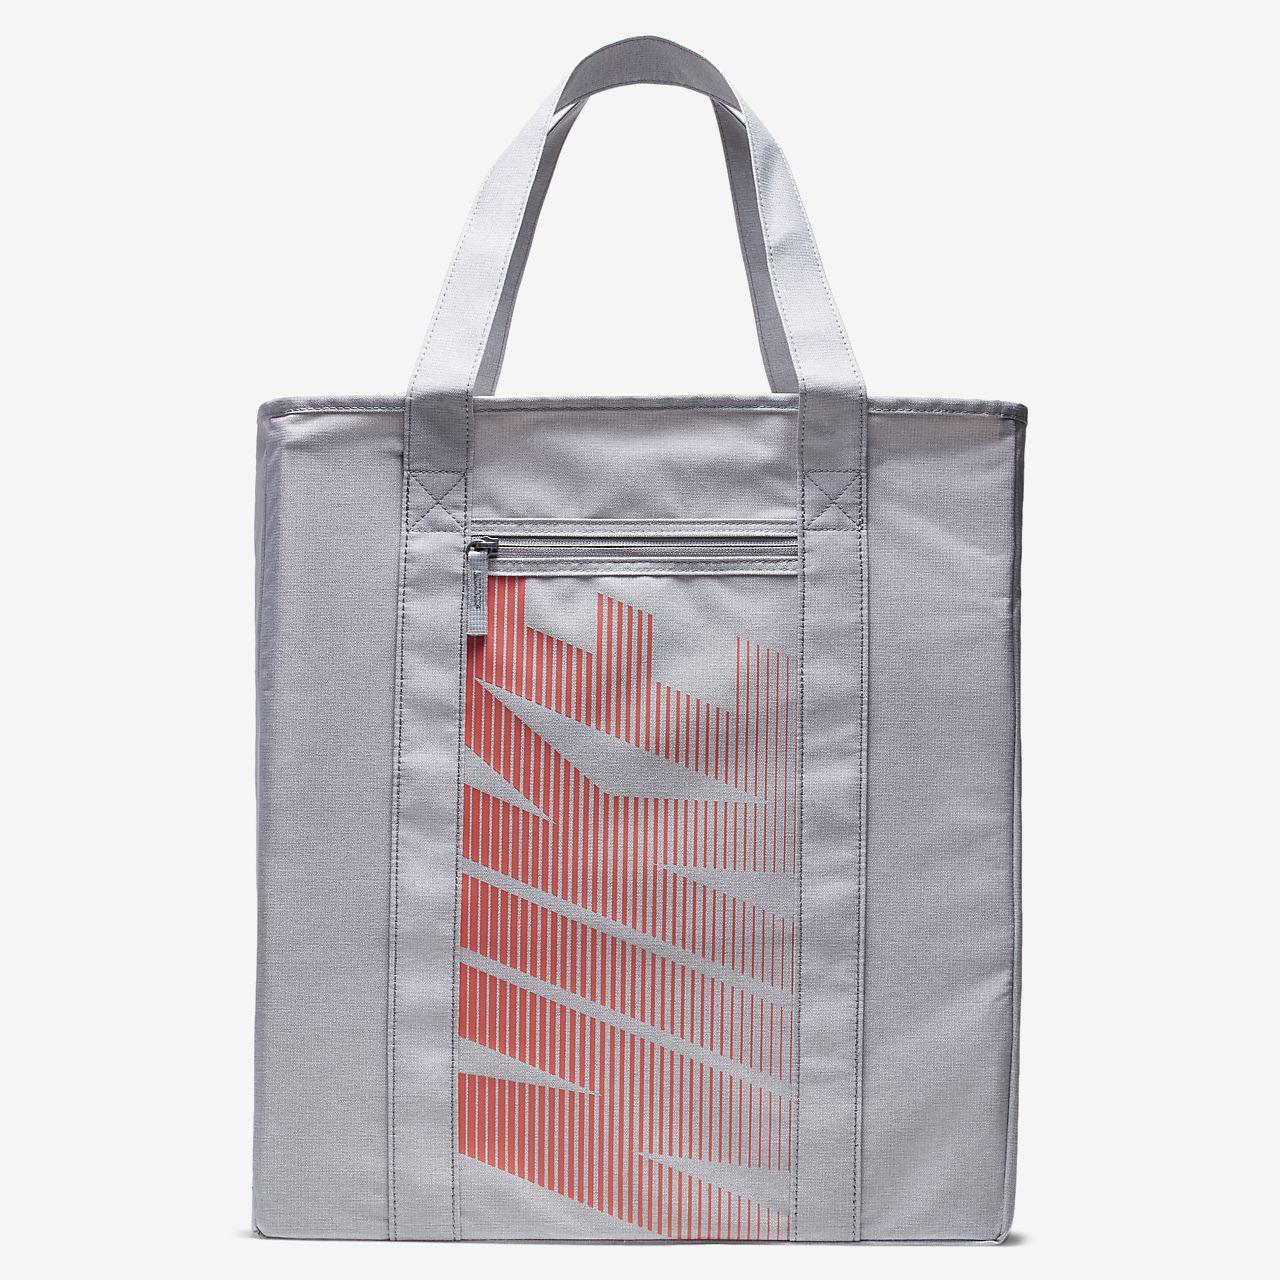 Nike Gym Tote Bag